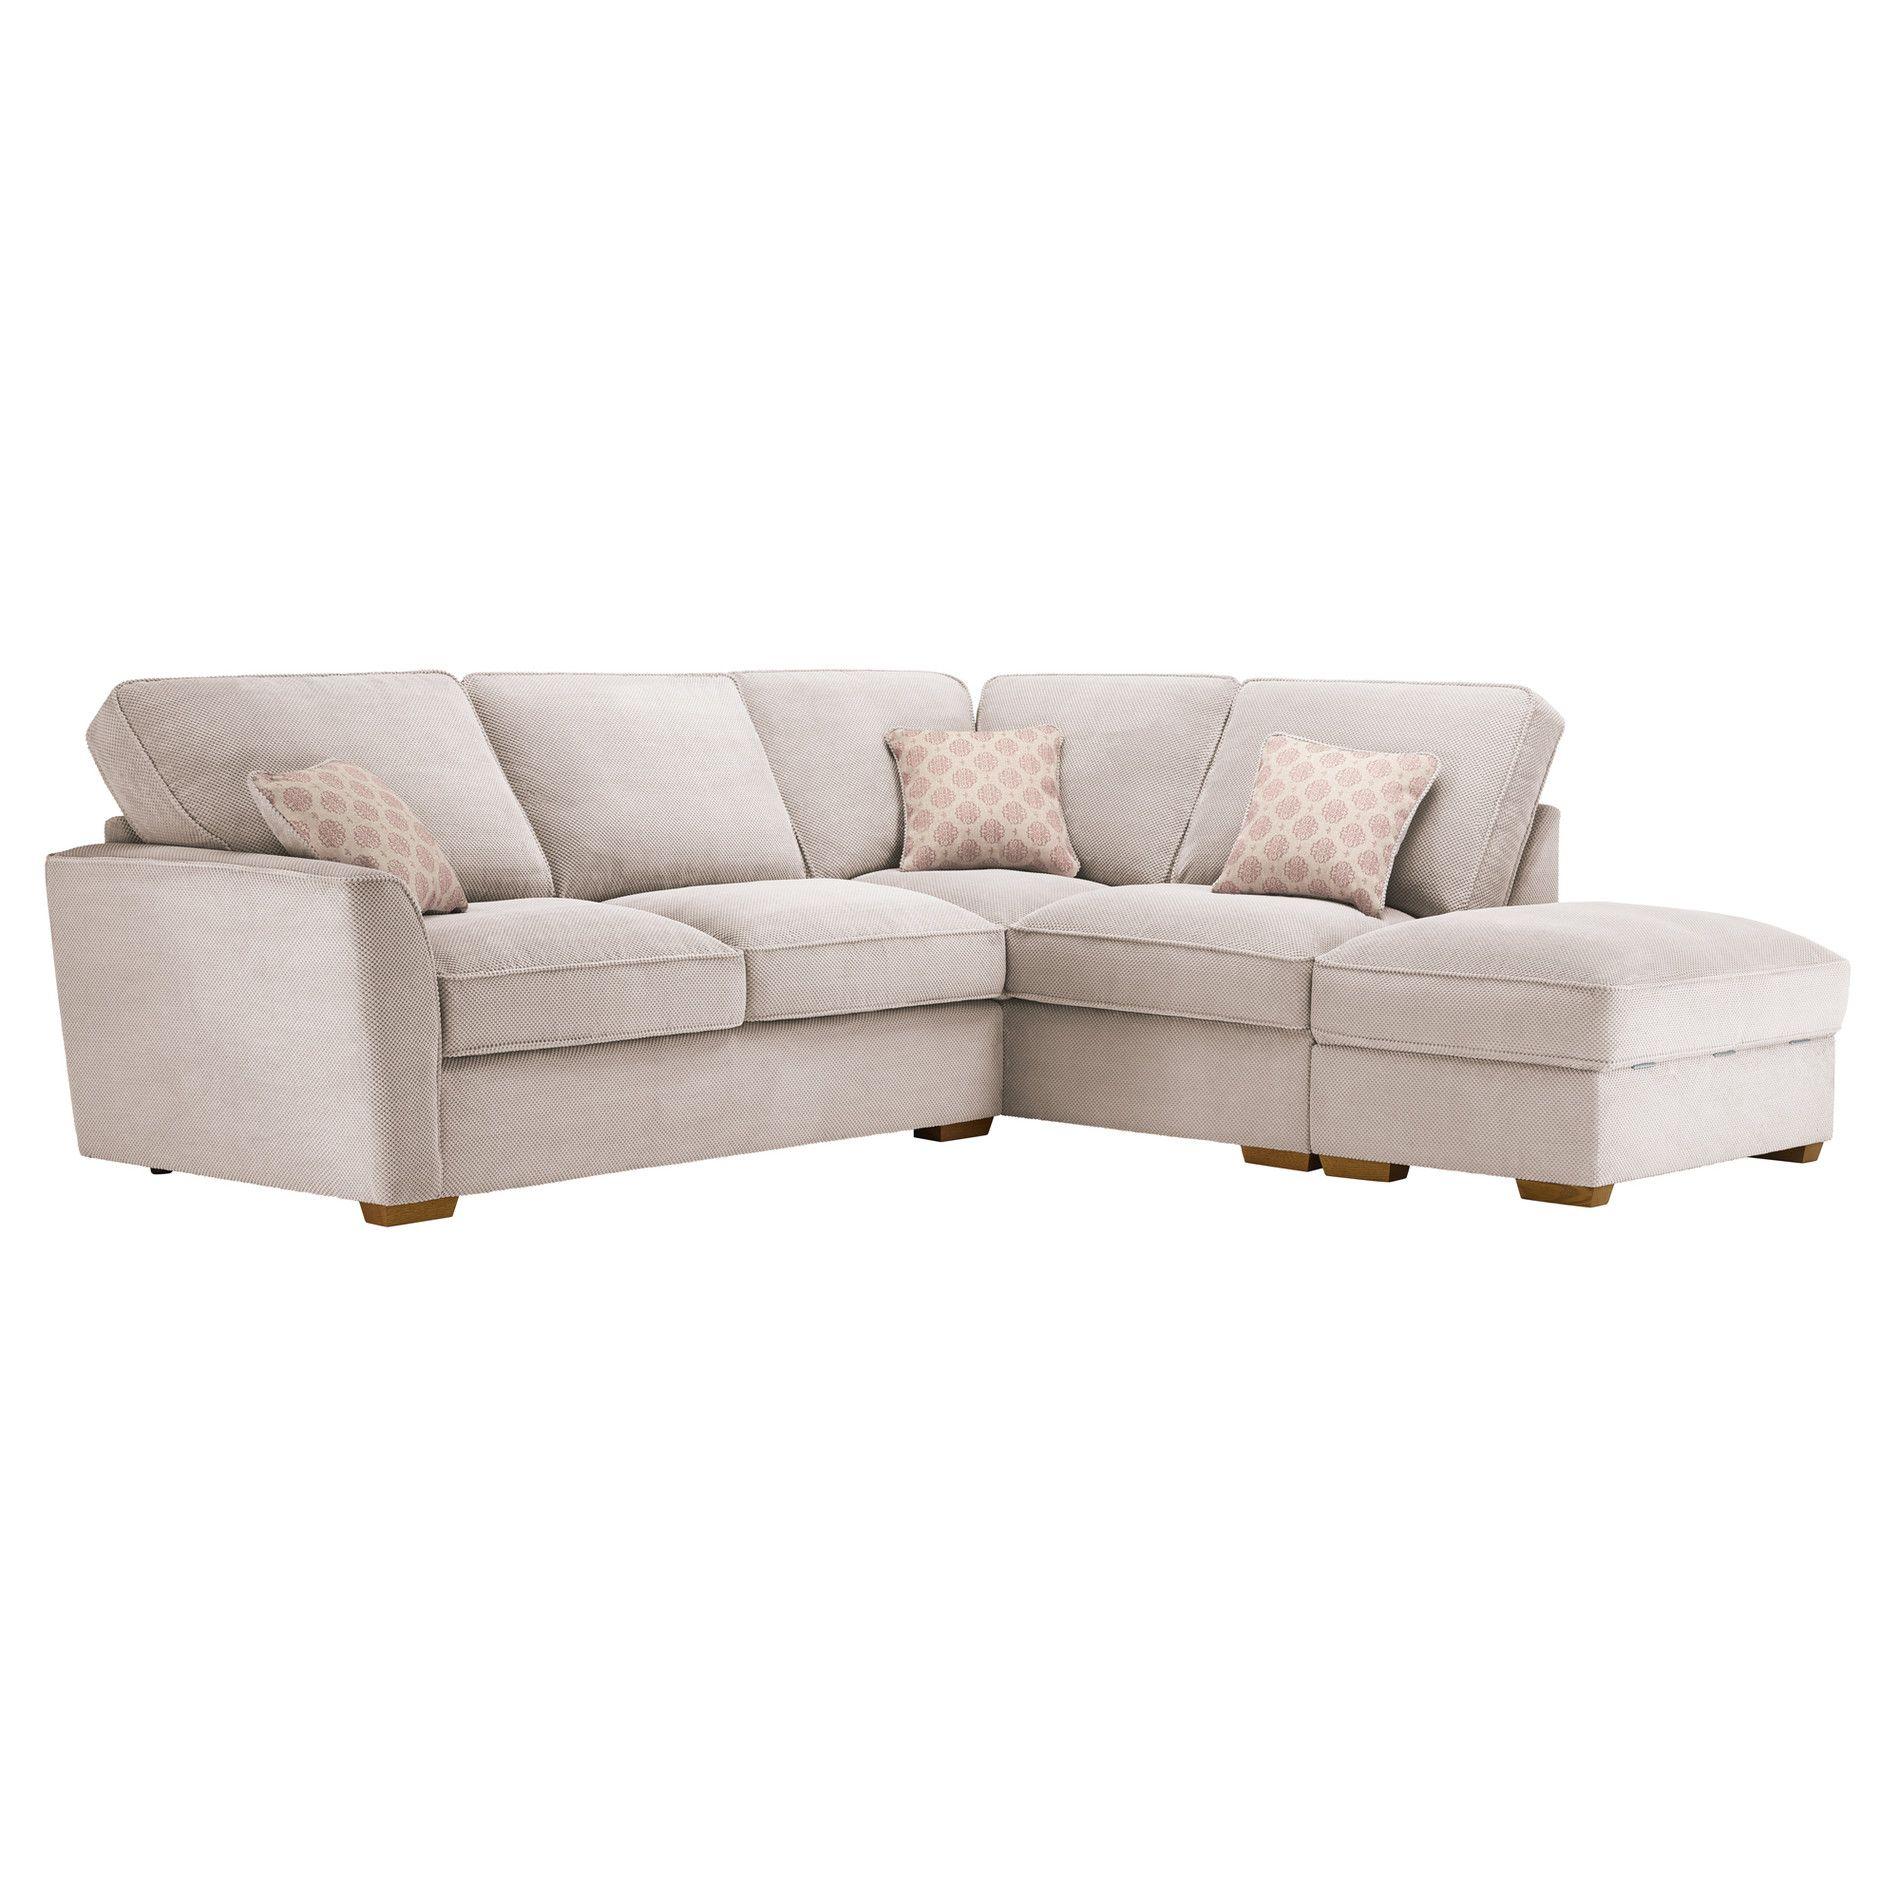 Fawn Fabric Sofas Corner Sofa Left Hand Nebraska Range Oak Furnitureland Corner Sofa With Storage Storage Footstool Corner Sofa